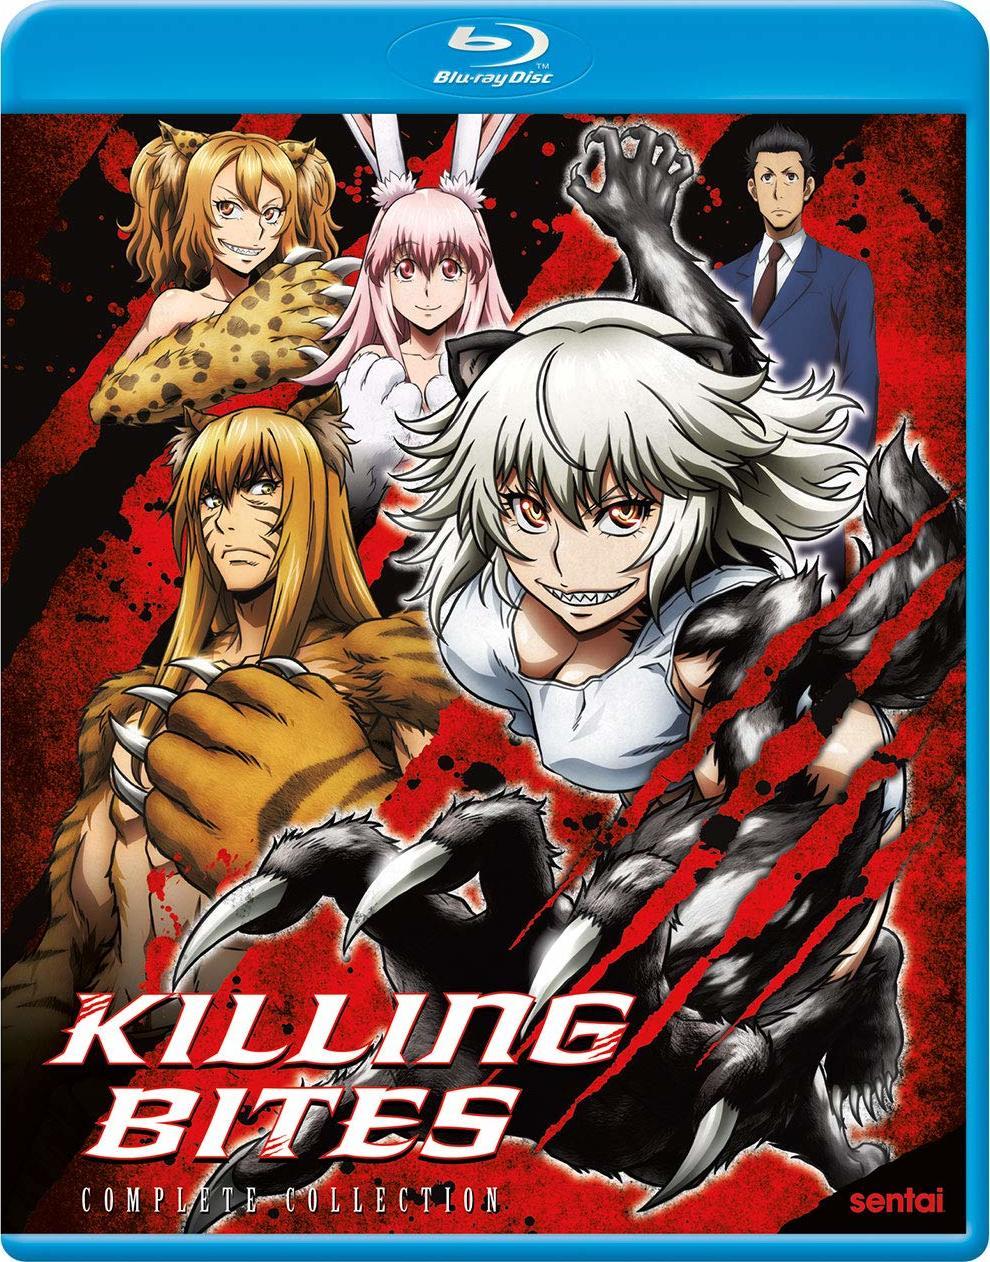 Killing Bites 2018 - BluRay 1080p Legendado Completo